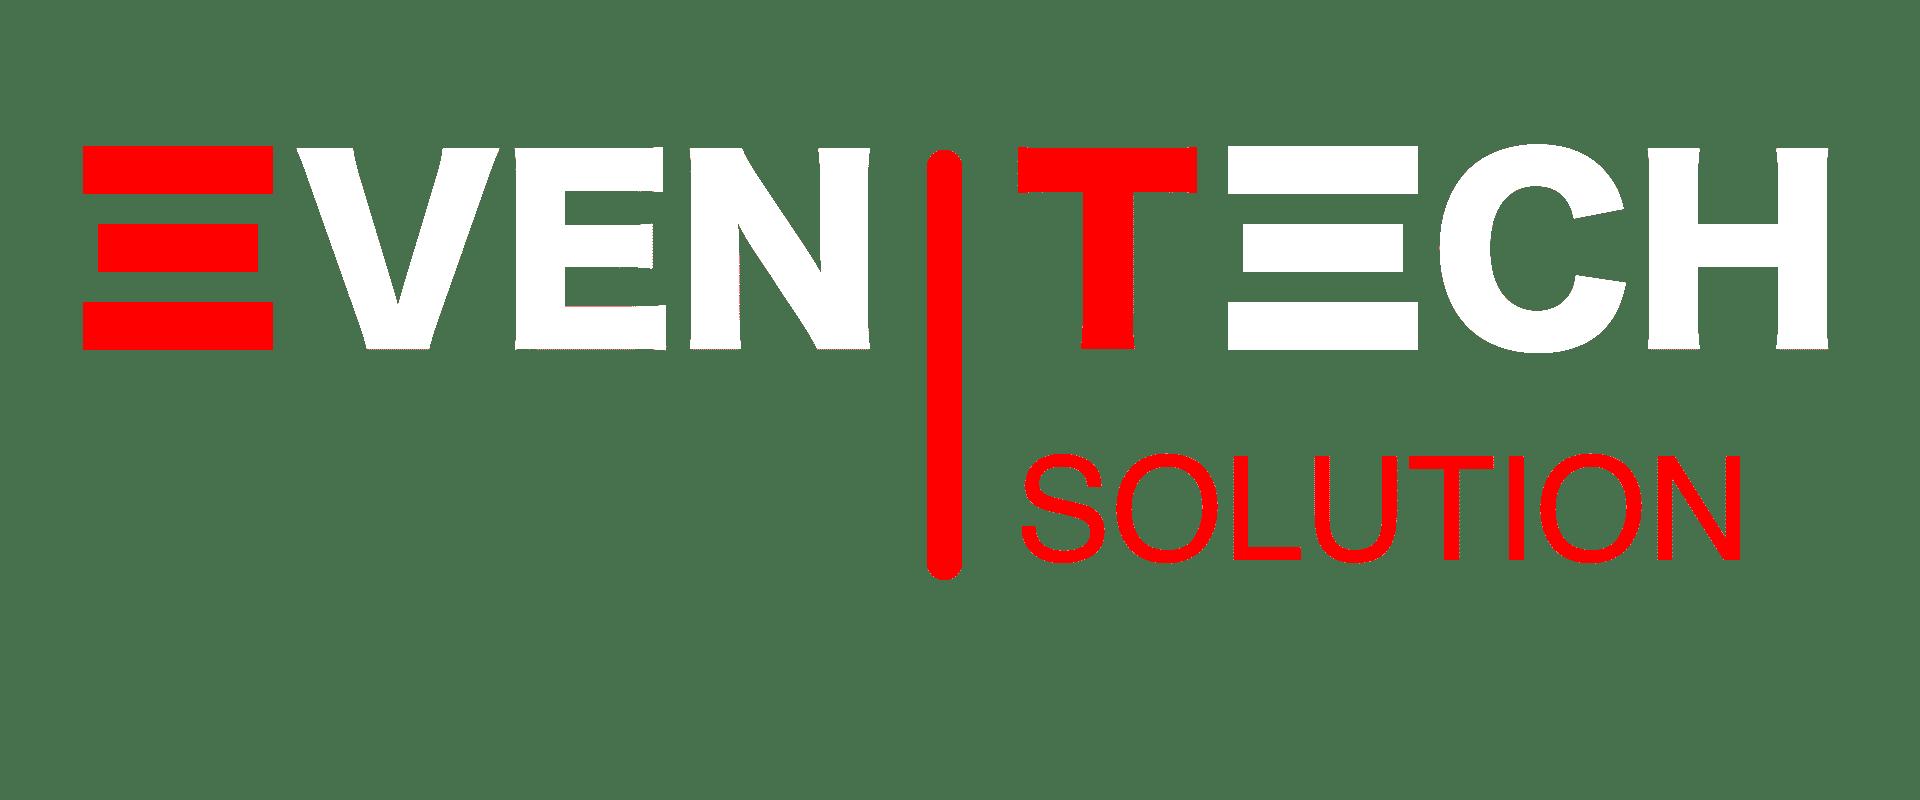 EvenTechSolution